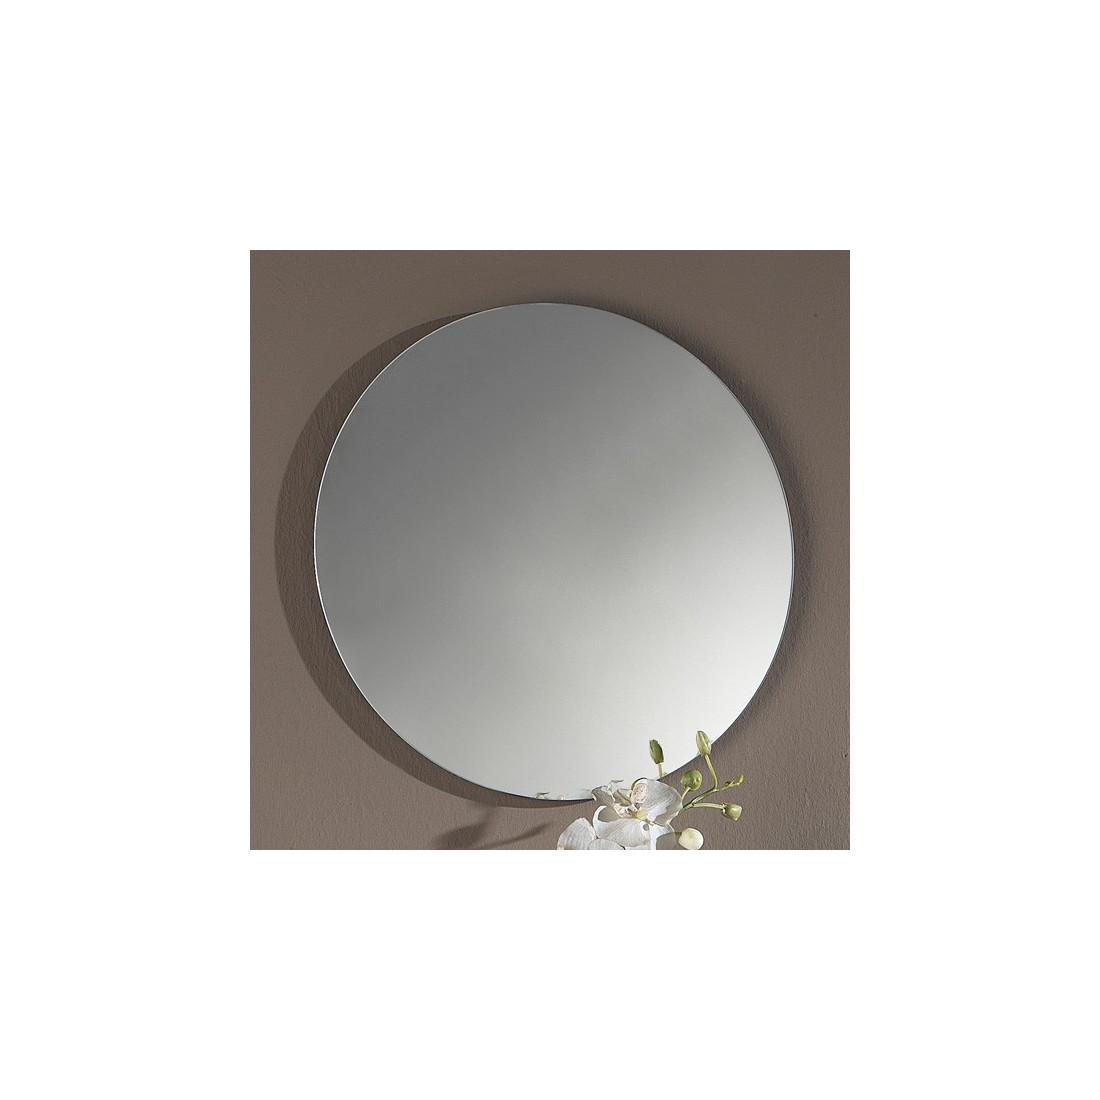 Meuble d 39 entr e cendre miroir tiga univers petits for Meuble d entree miroir